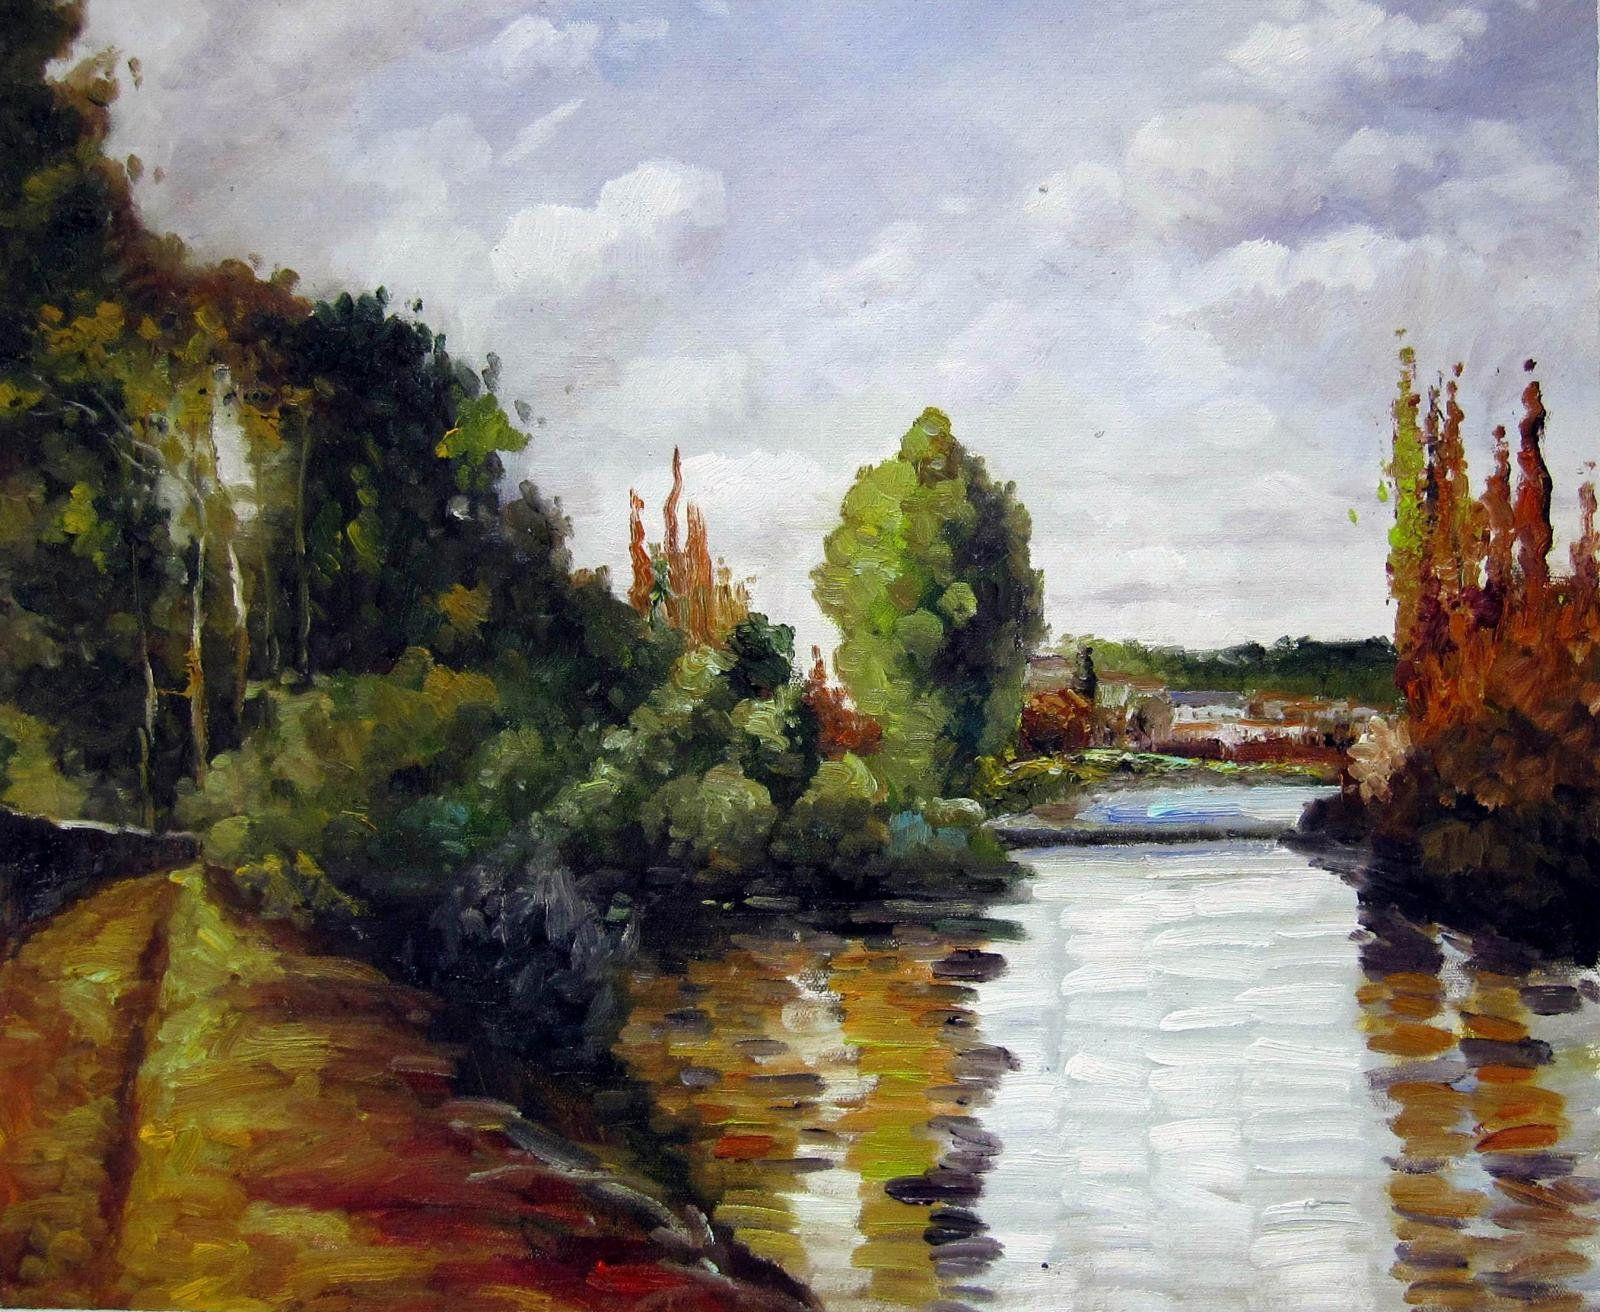 Pin by Kate Grishakova on My Bratislava paintings